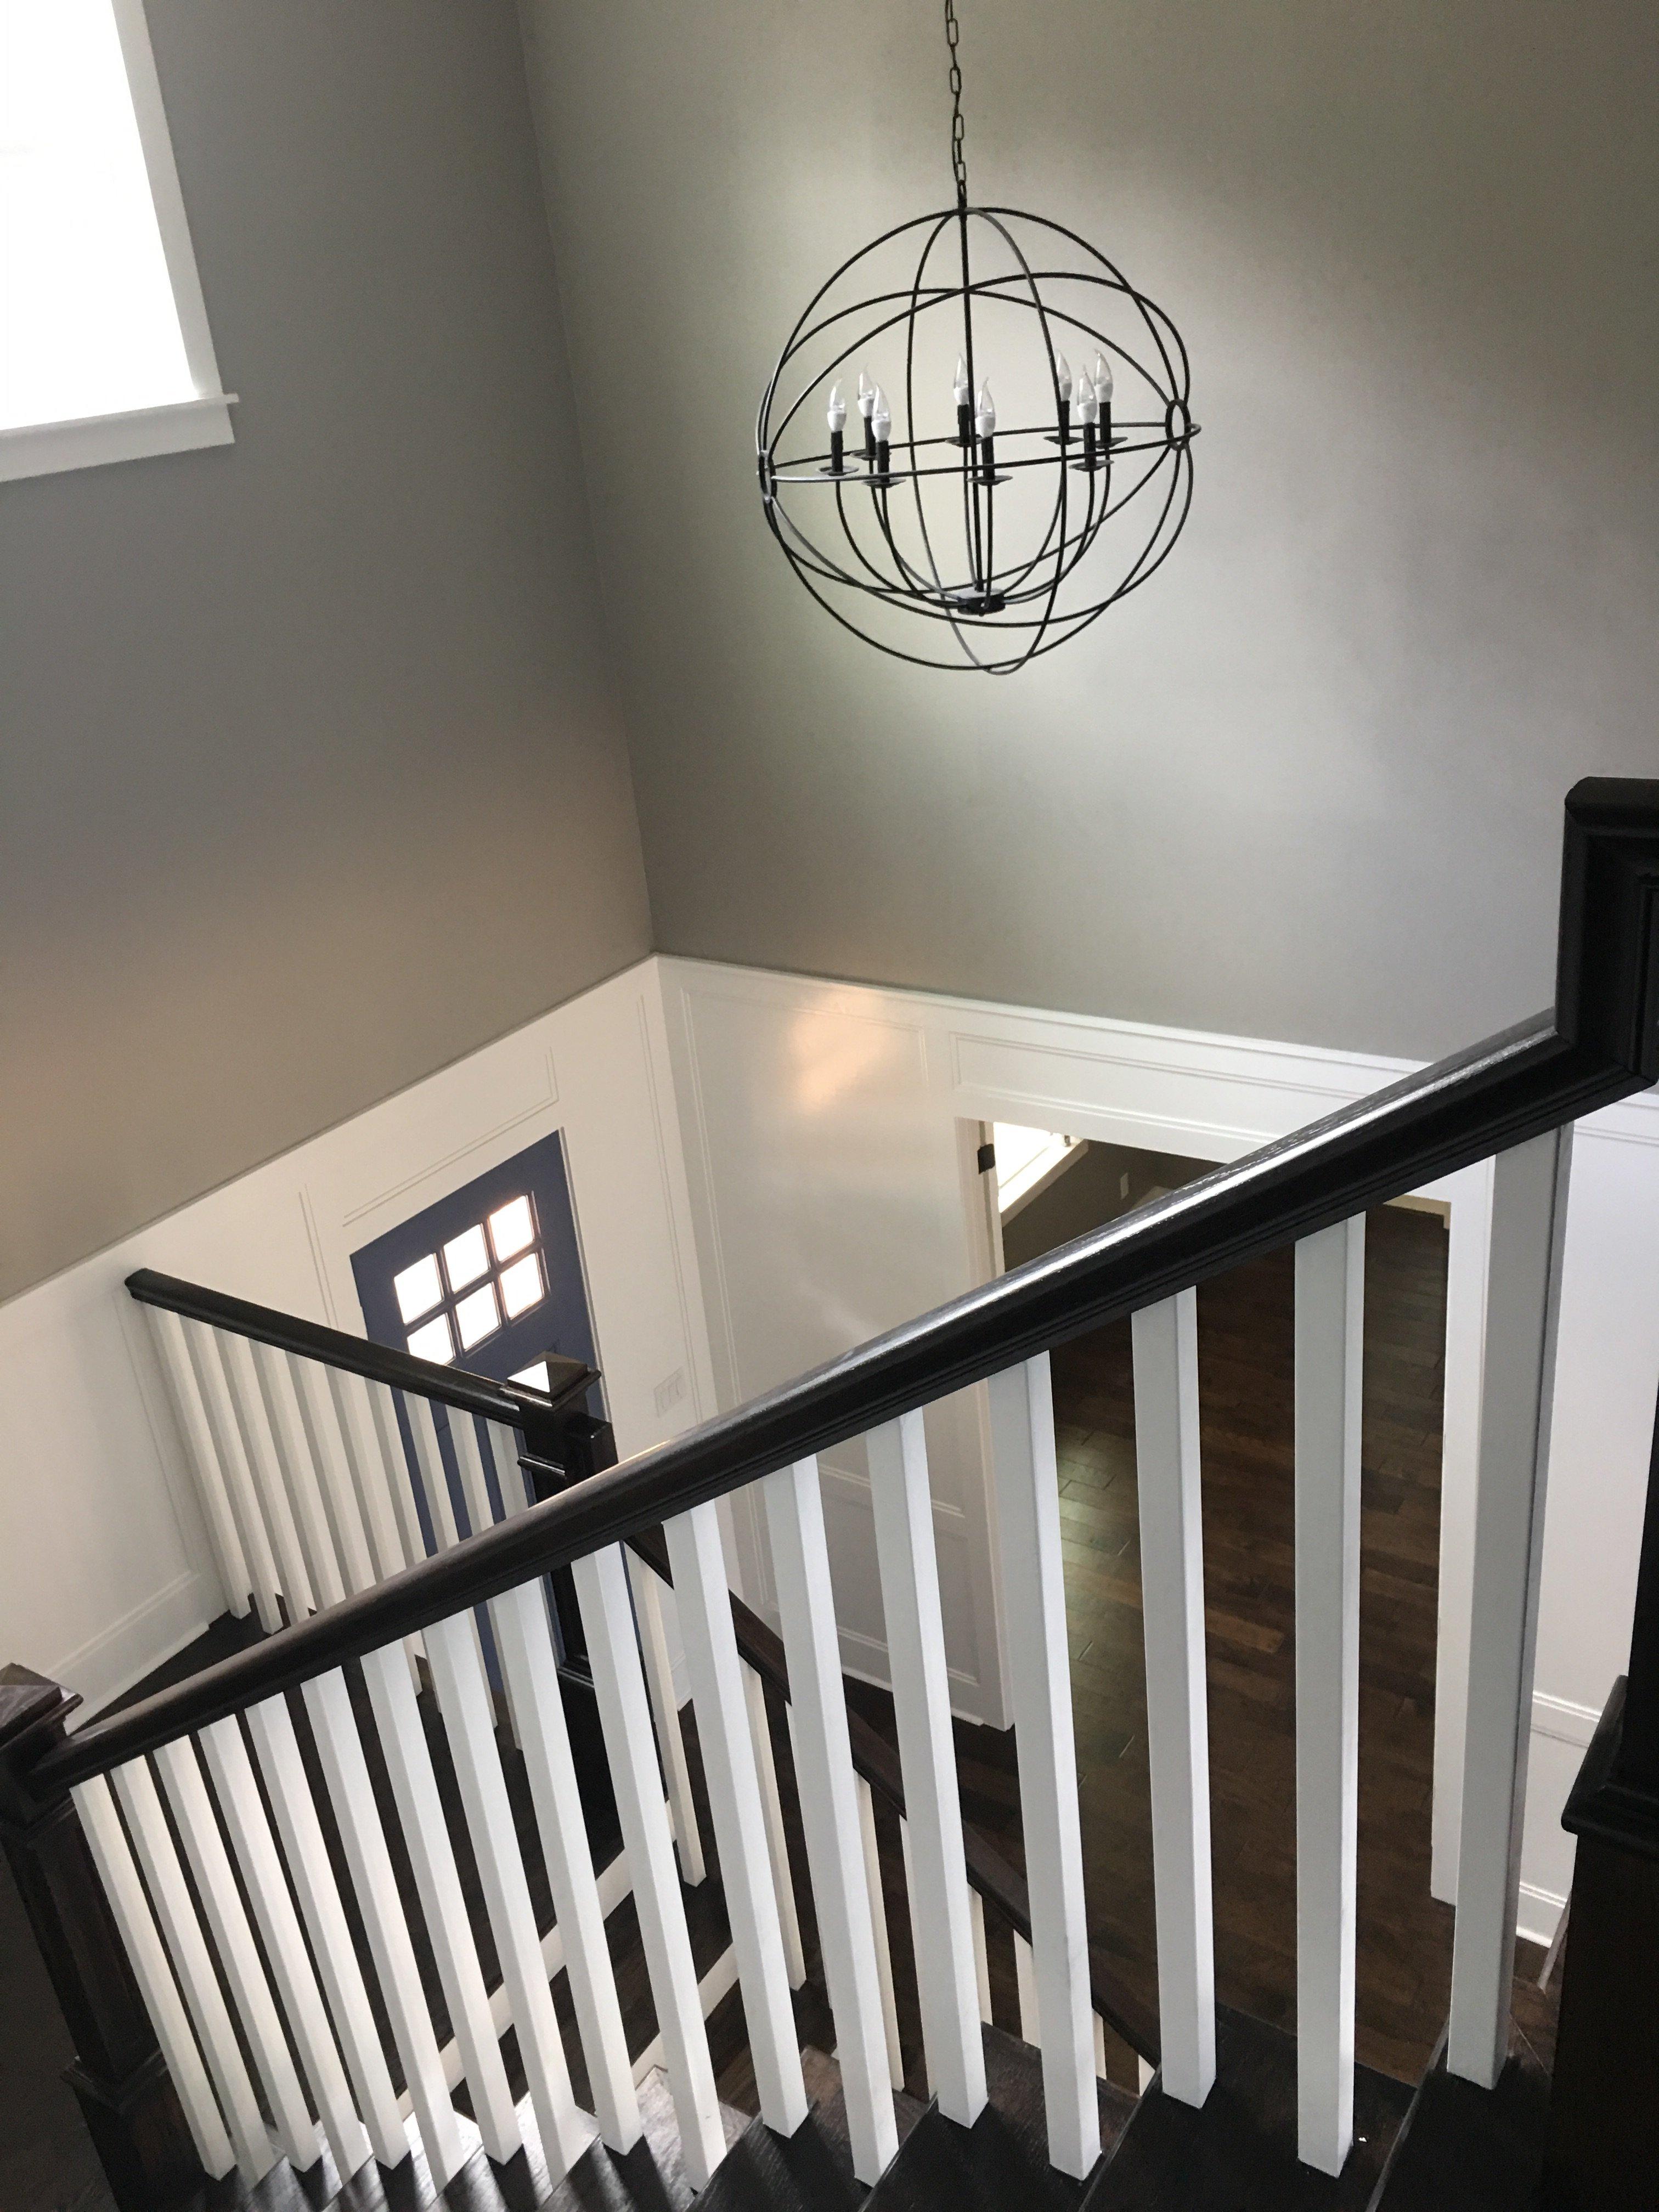 Wood stairway with white railings